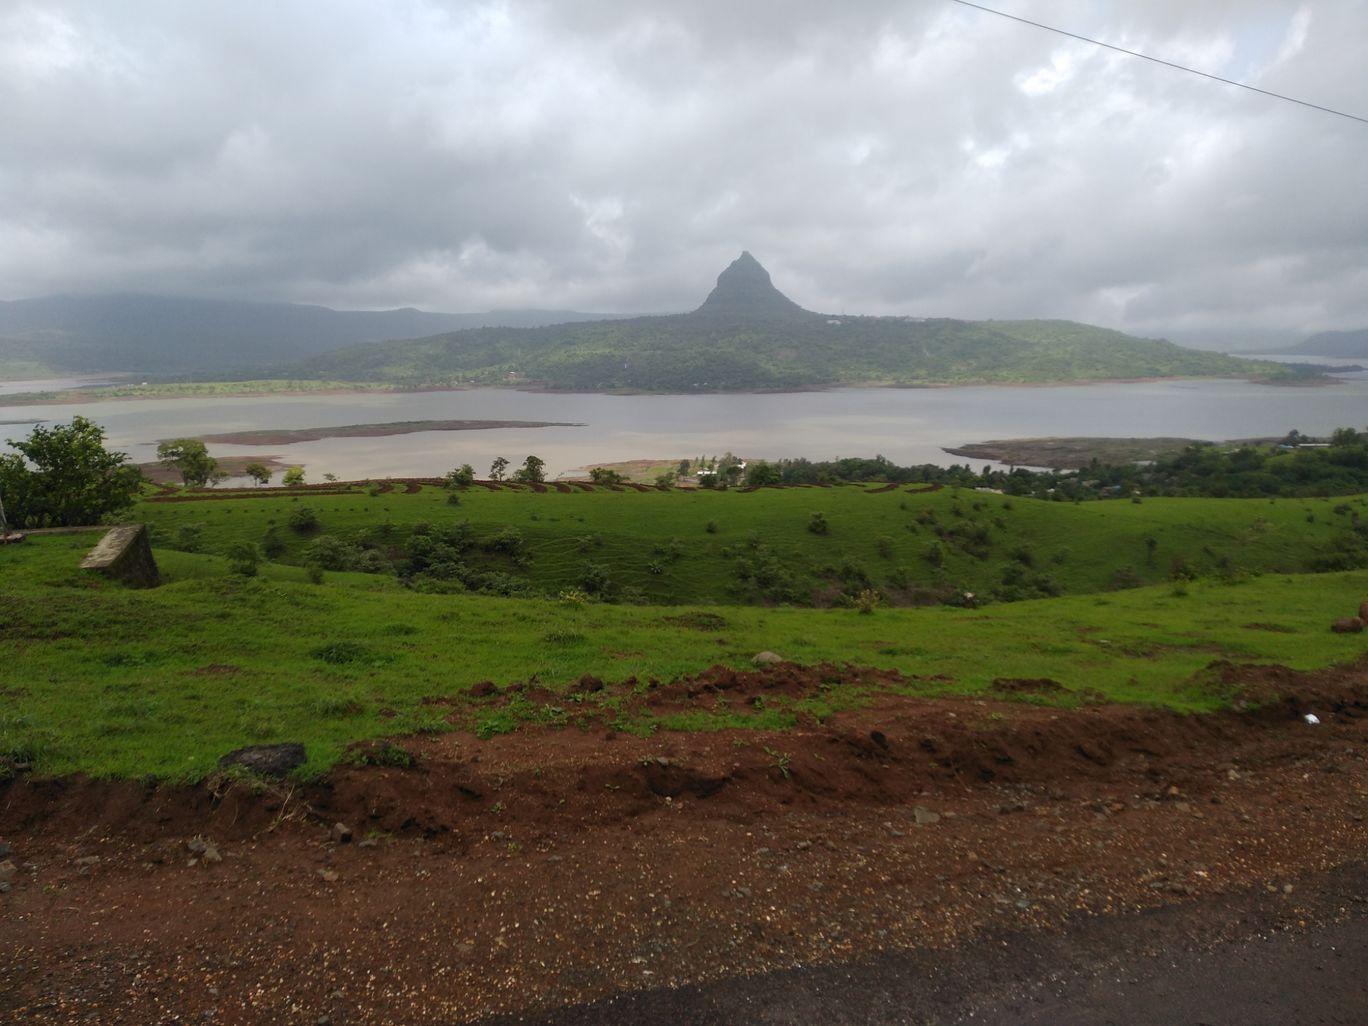 Photo of Tikona Fort By Shubham Kadam